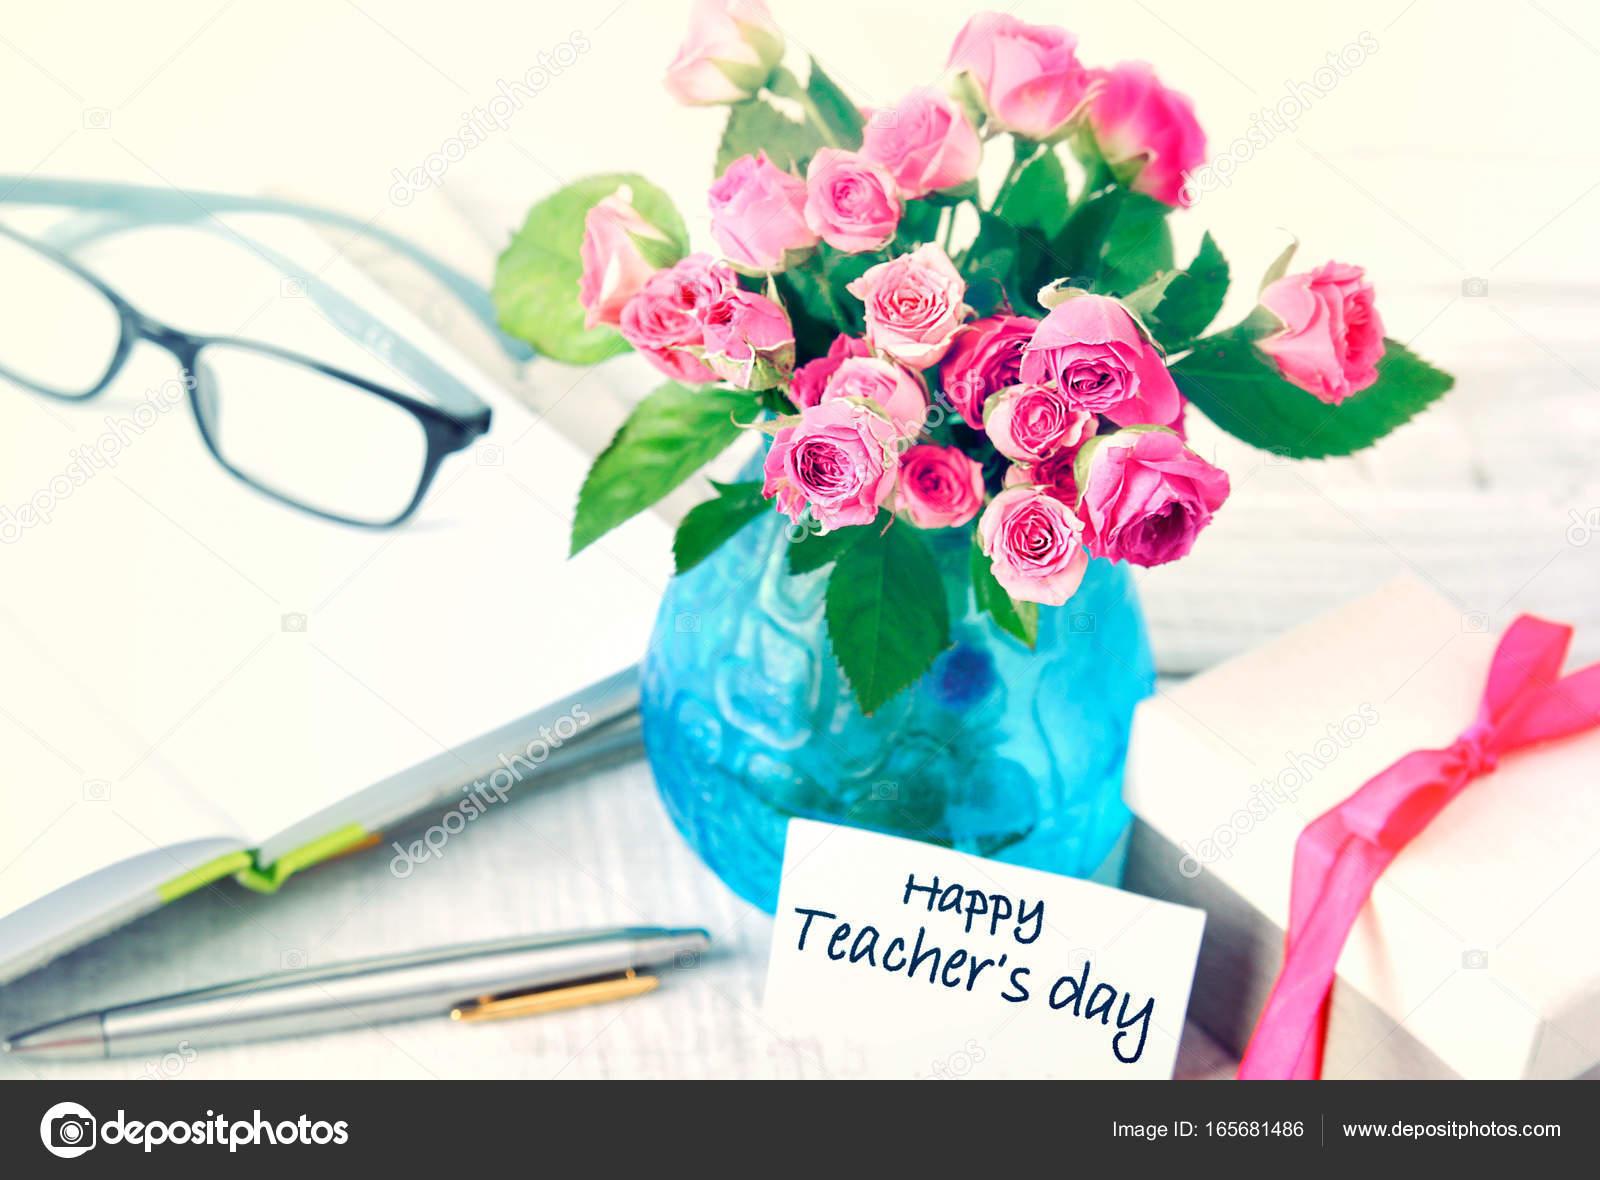 Teachers day greeting card stock photo nys 165681486 teachers day greeting card stock photo m4hsunfo